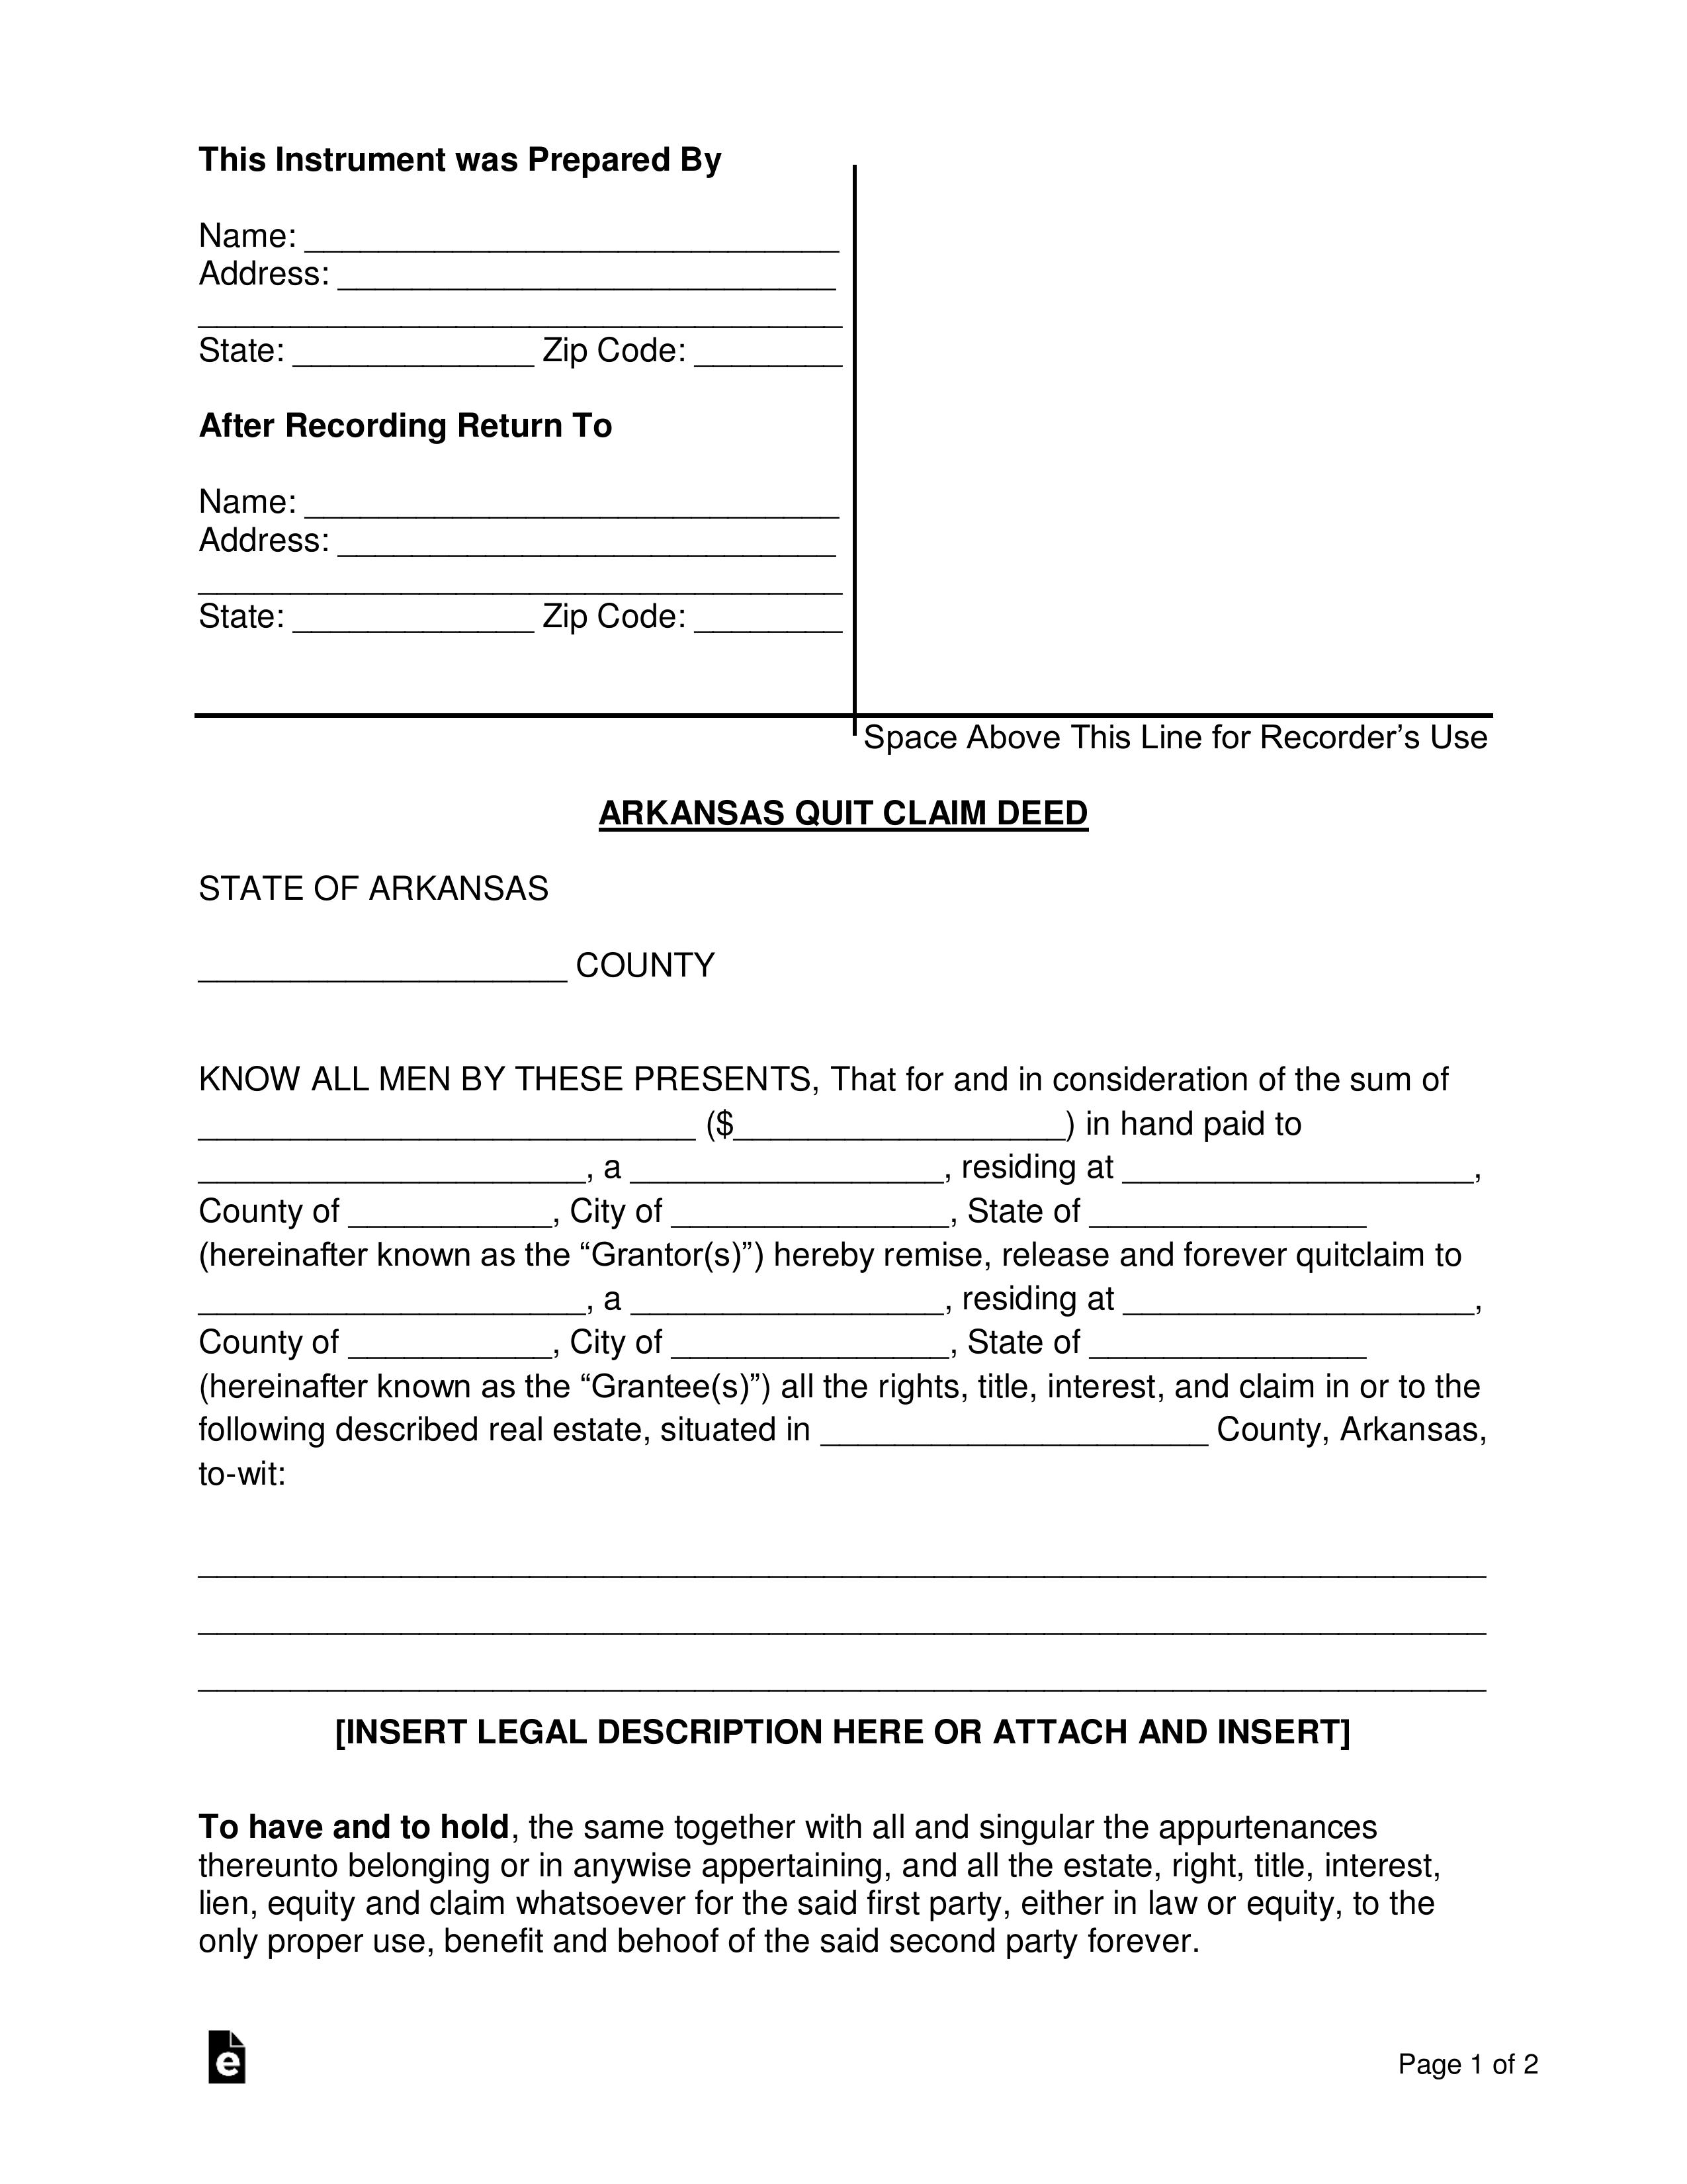 quick claim deed form arkansas  Free Arkansas Quit Claim Deed Form - Word | PDF | eForms ...